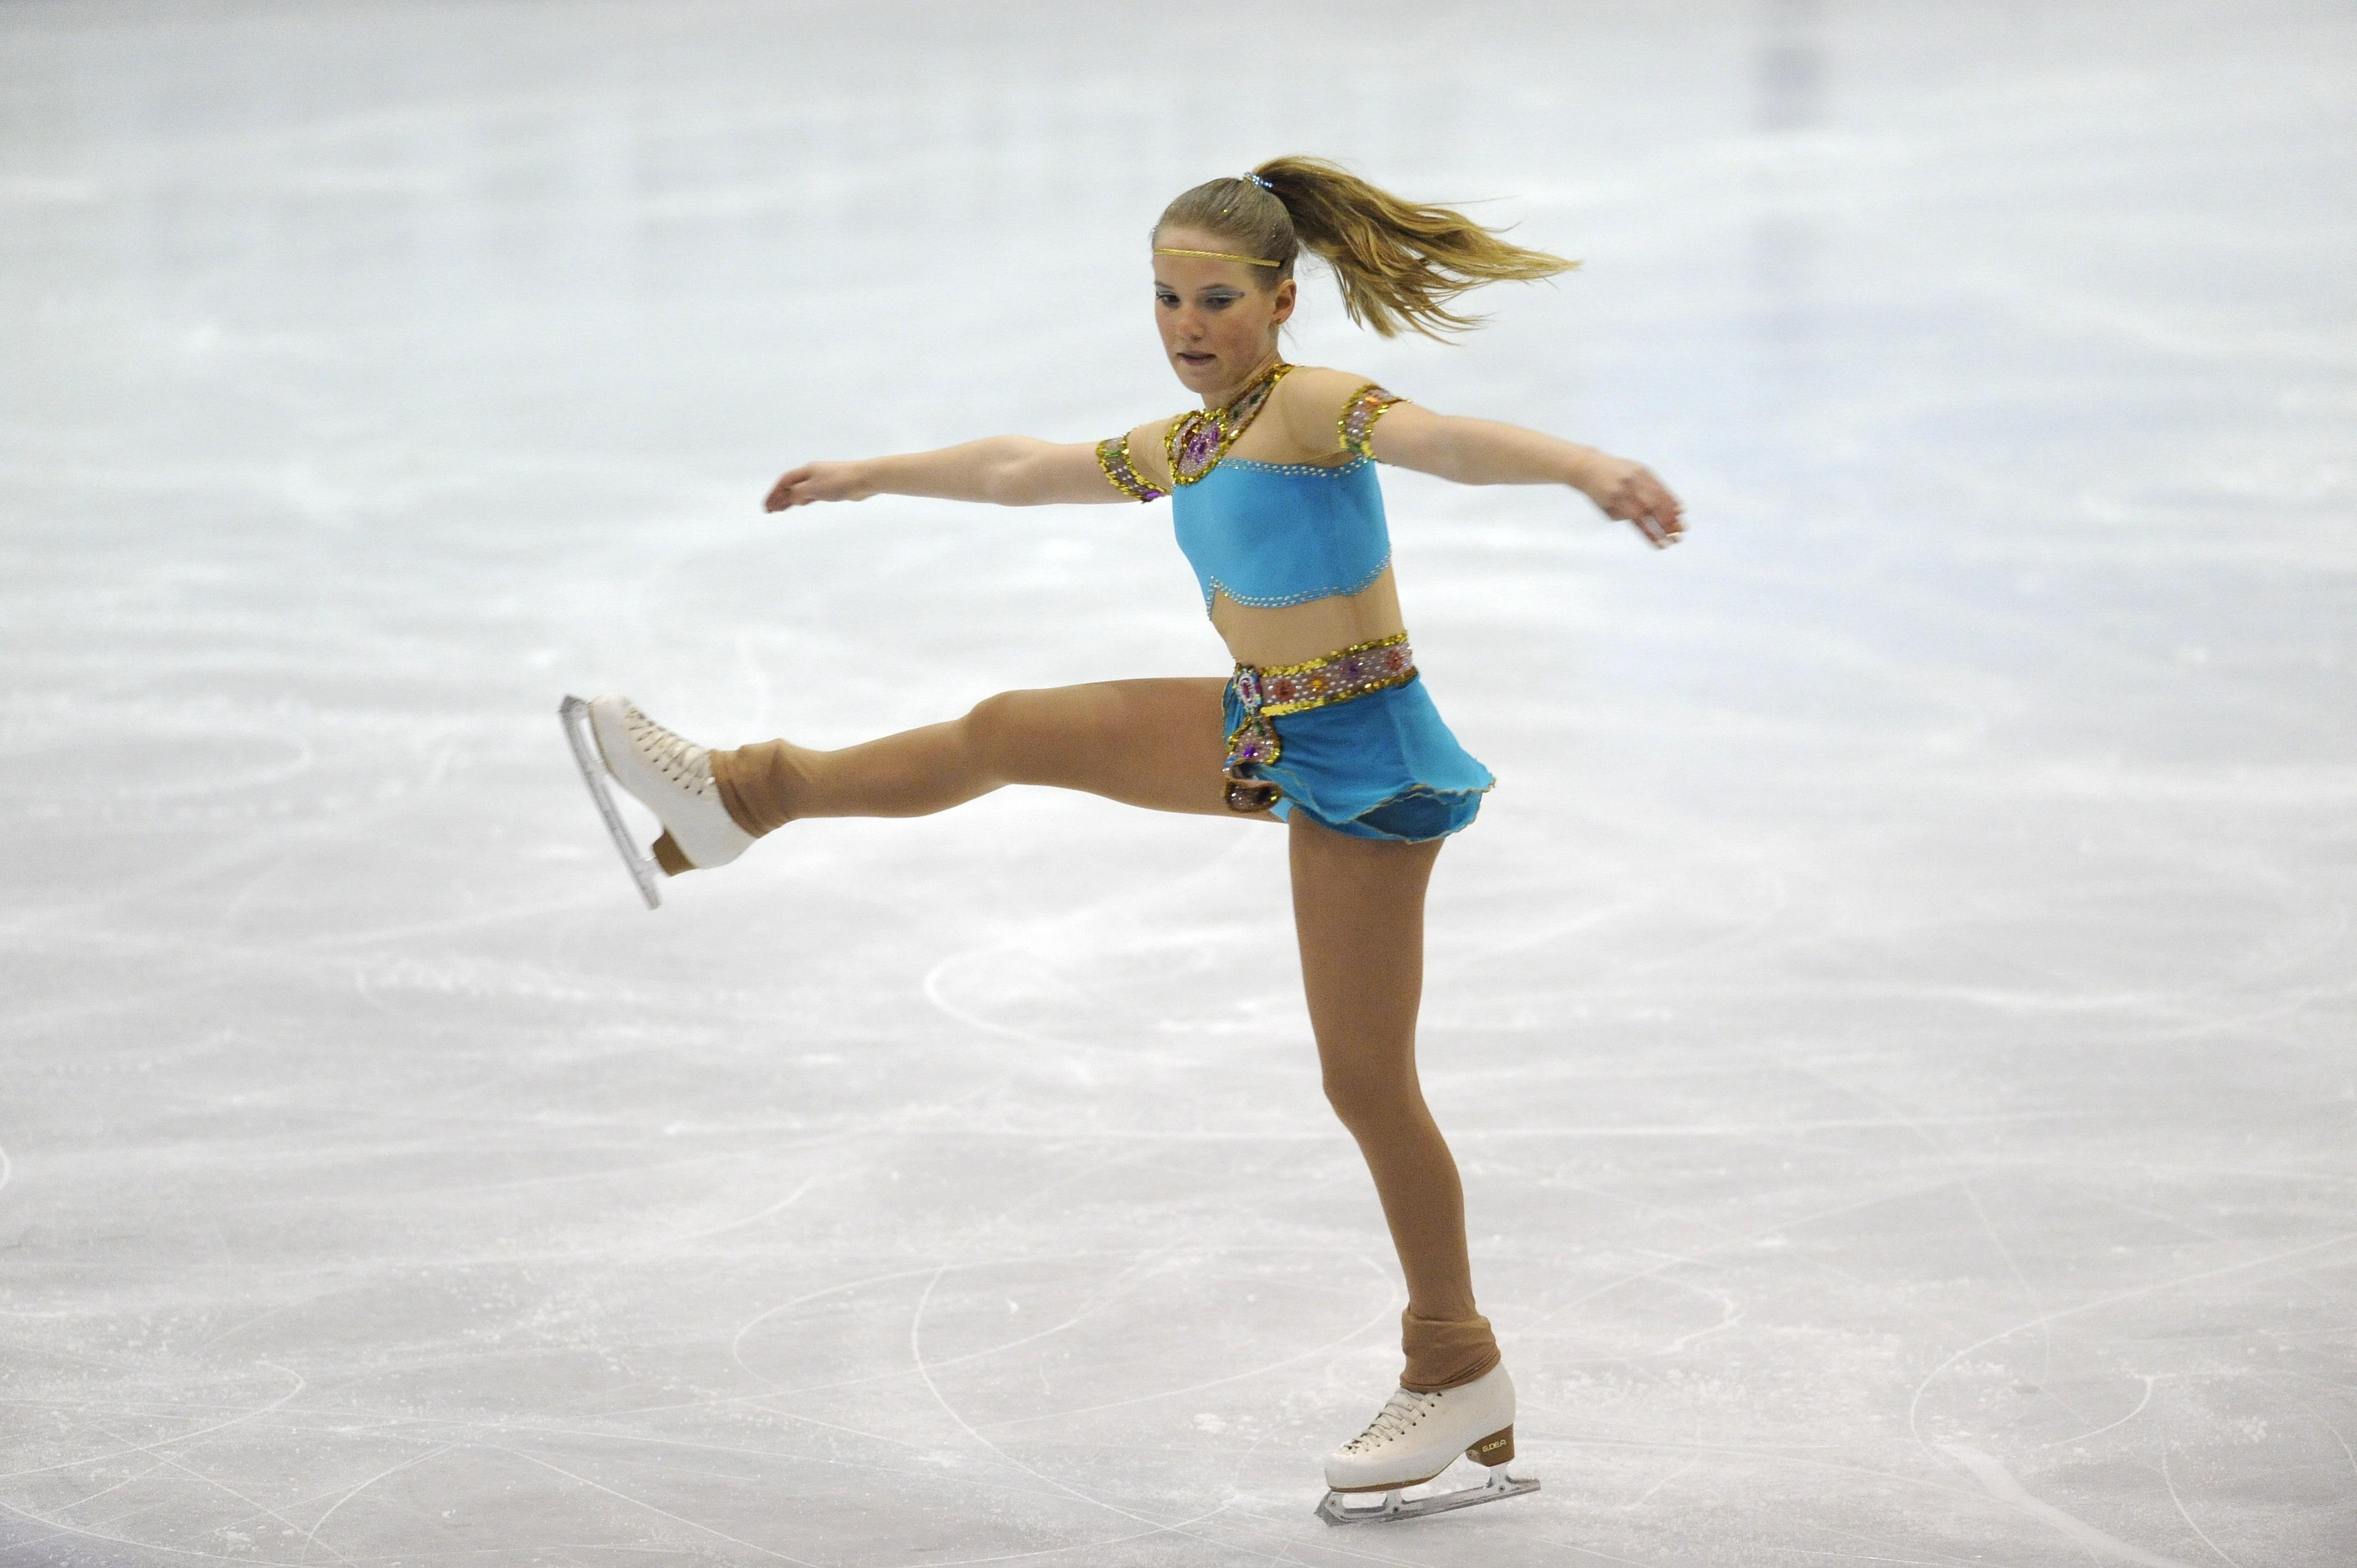 Caya Scheepens spin